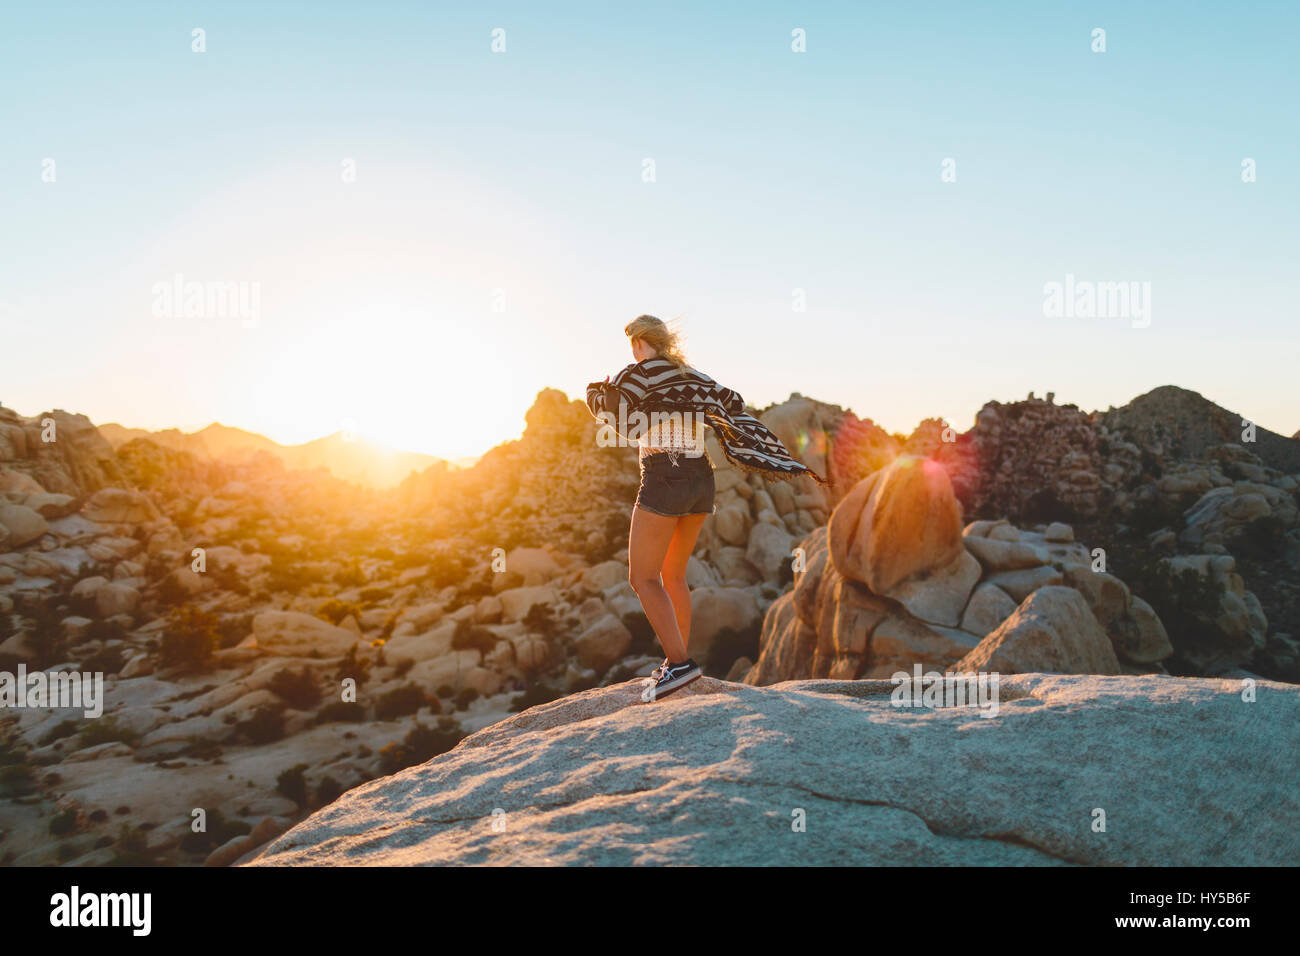 USA, California, Woman at rocks in Joshua Tree National Park, - Stock Image